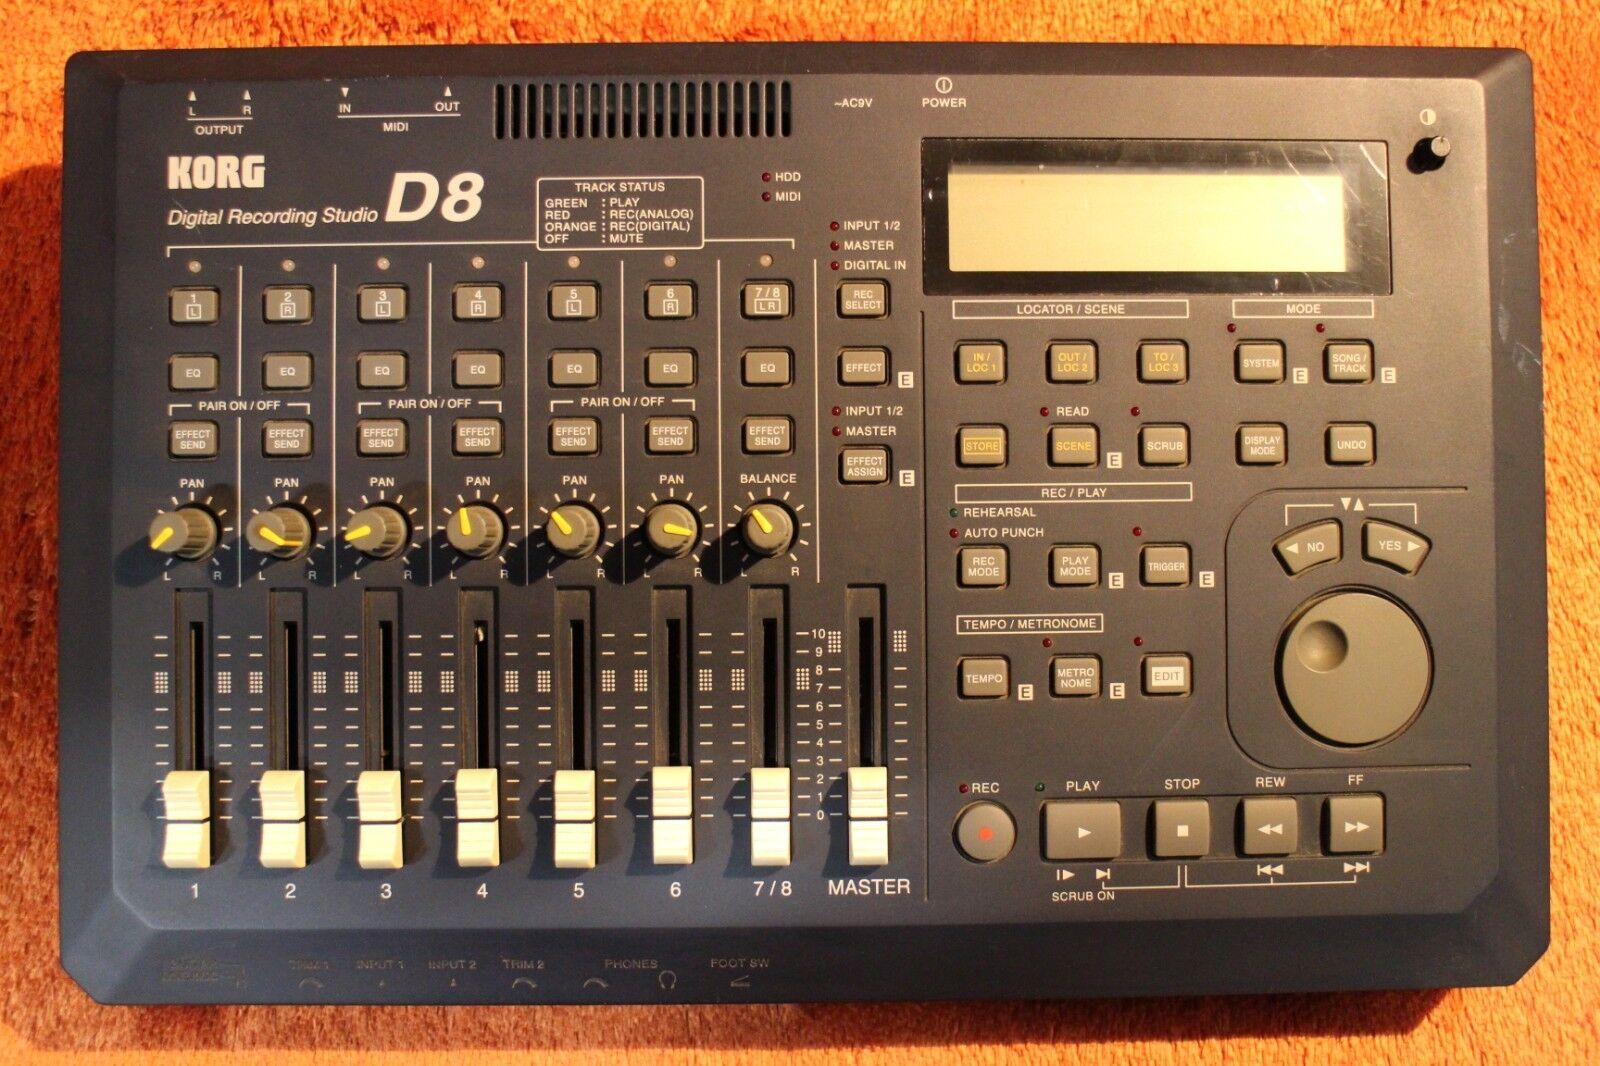 USED KORG D-8 D8 Digital Recording studio d8 Recorder MTR U392 190115